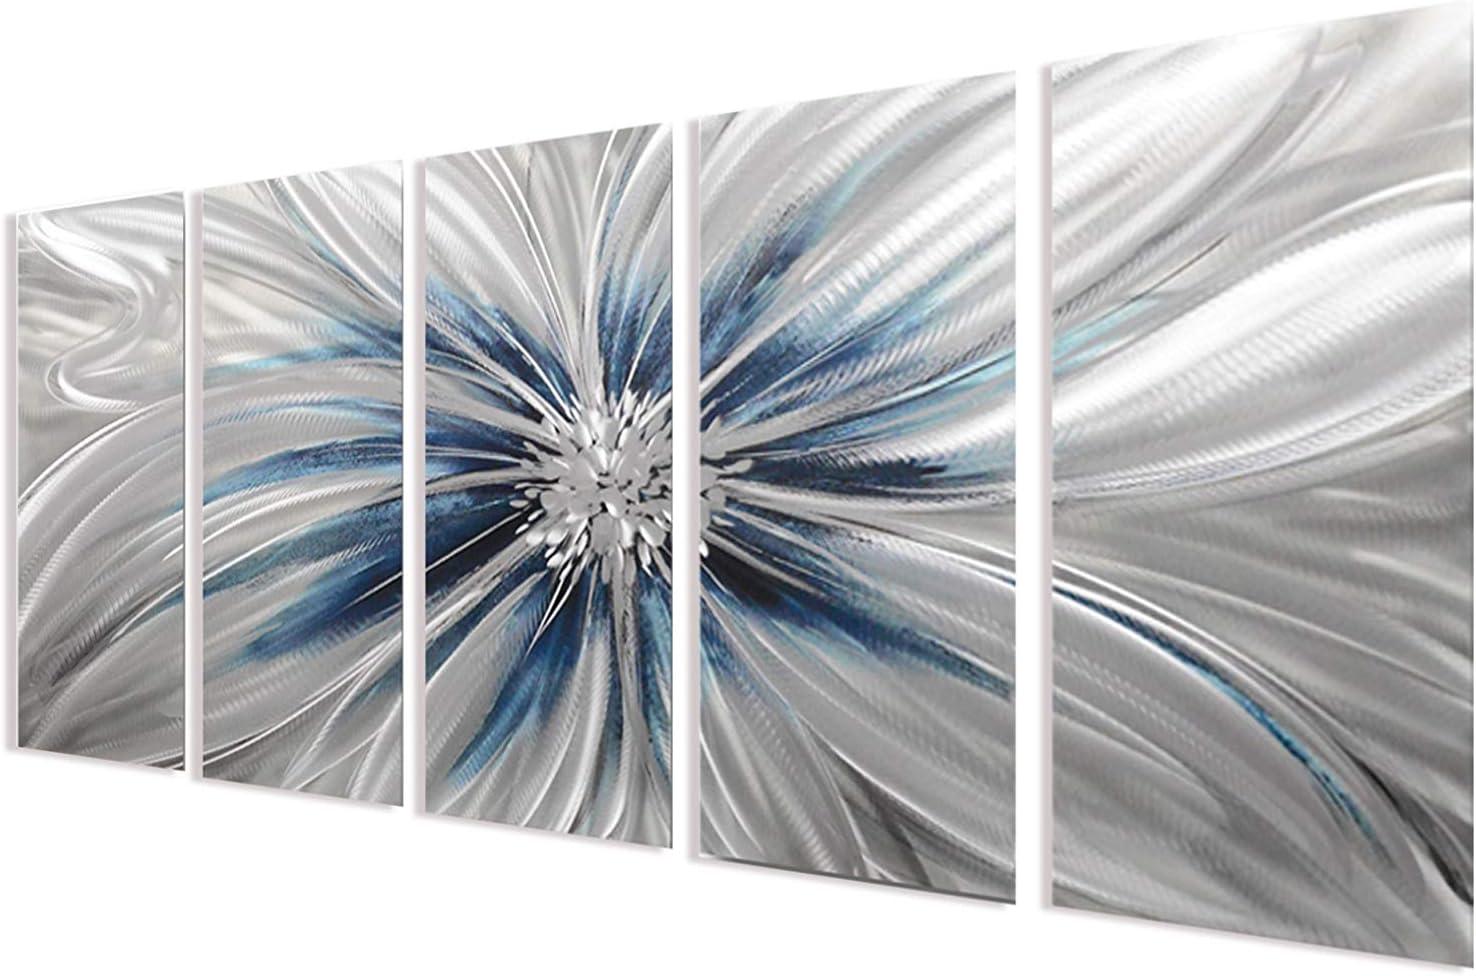 Silver Modern Sculpture Decor, Contemporary Metal Wall Art For Living Room